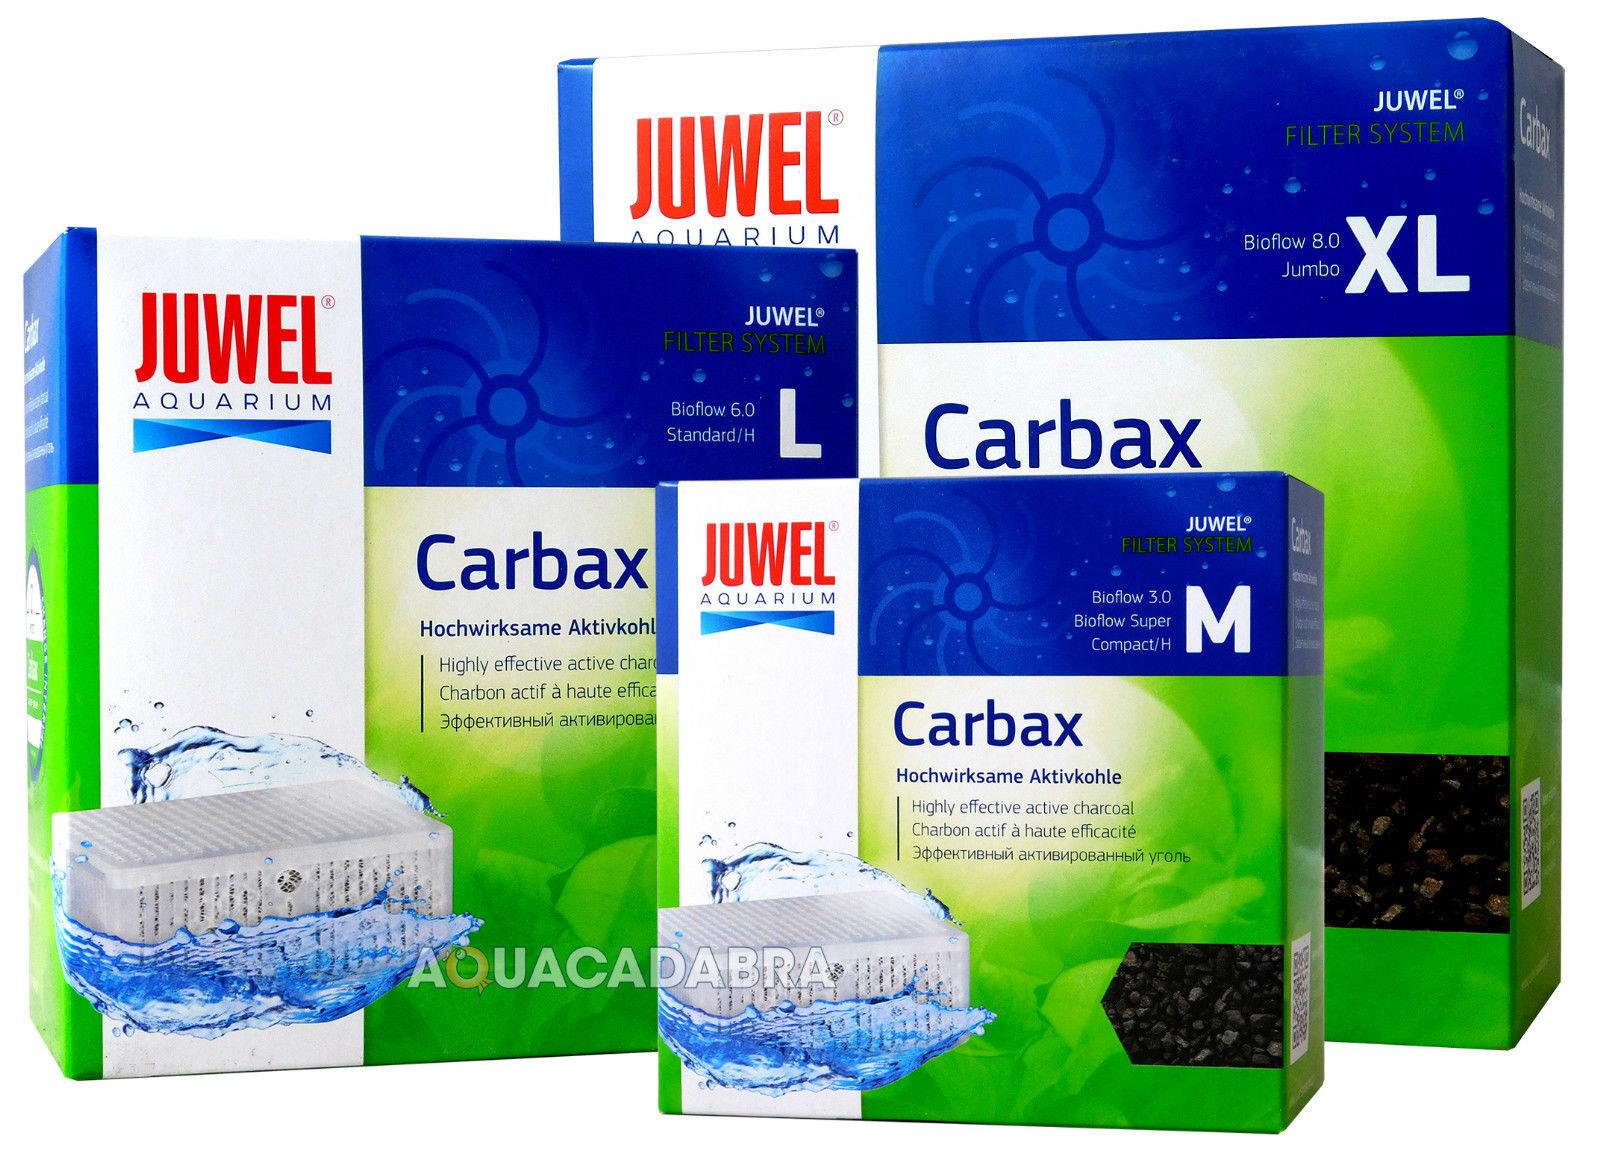 Genuine JUWEL Acquario carbax Carbonio Filtro Media Compact Standard JUMBO SERBATOIO